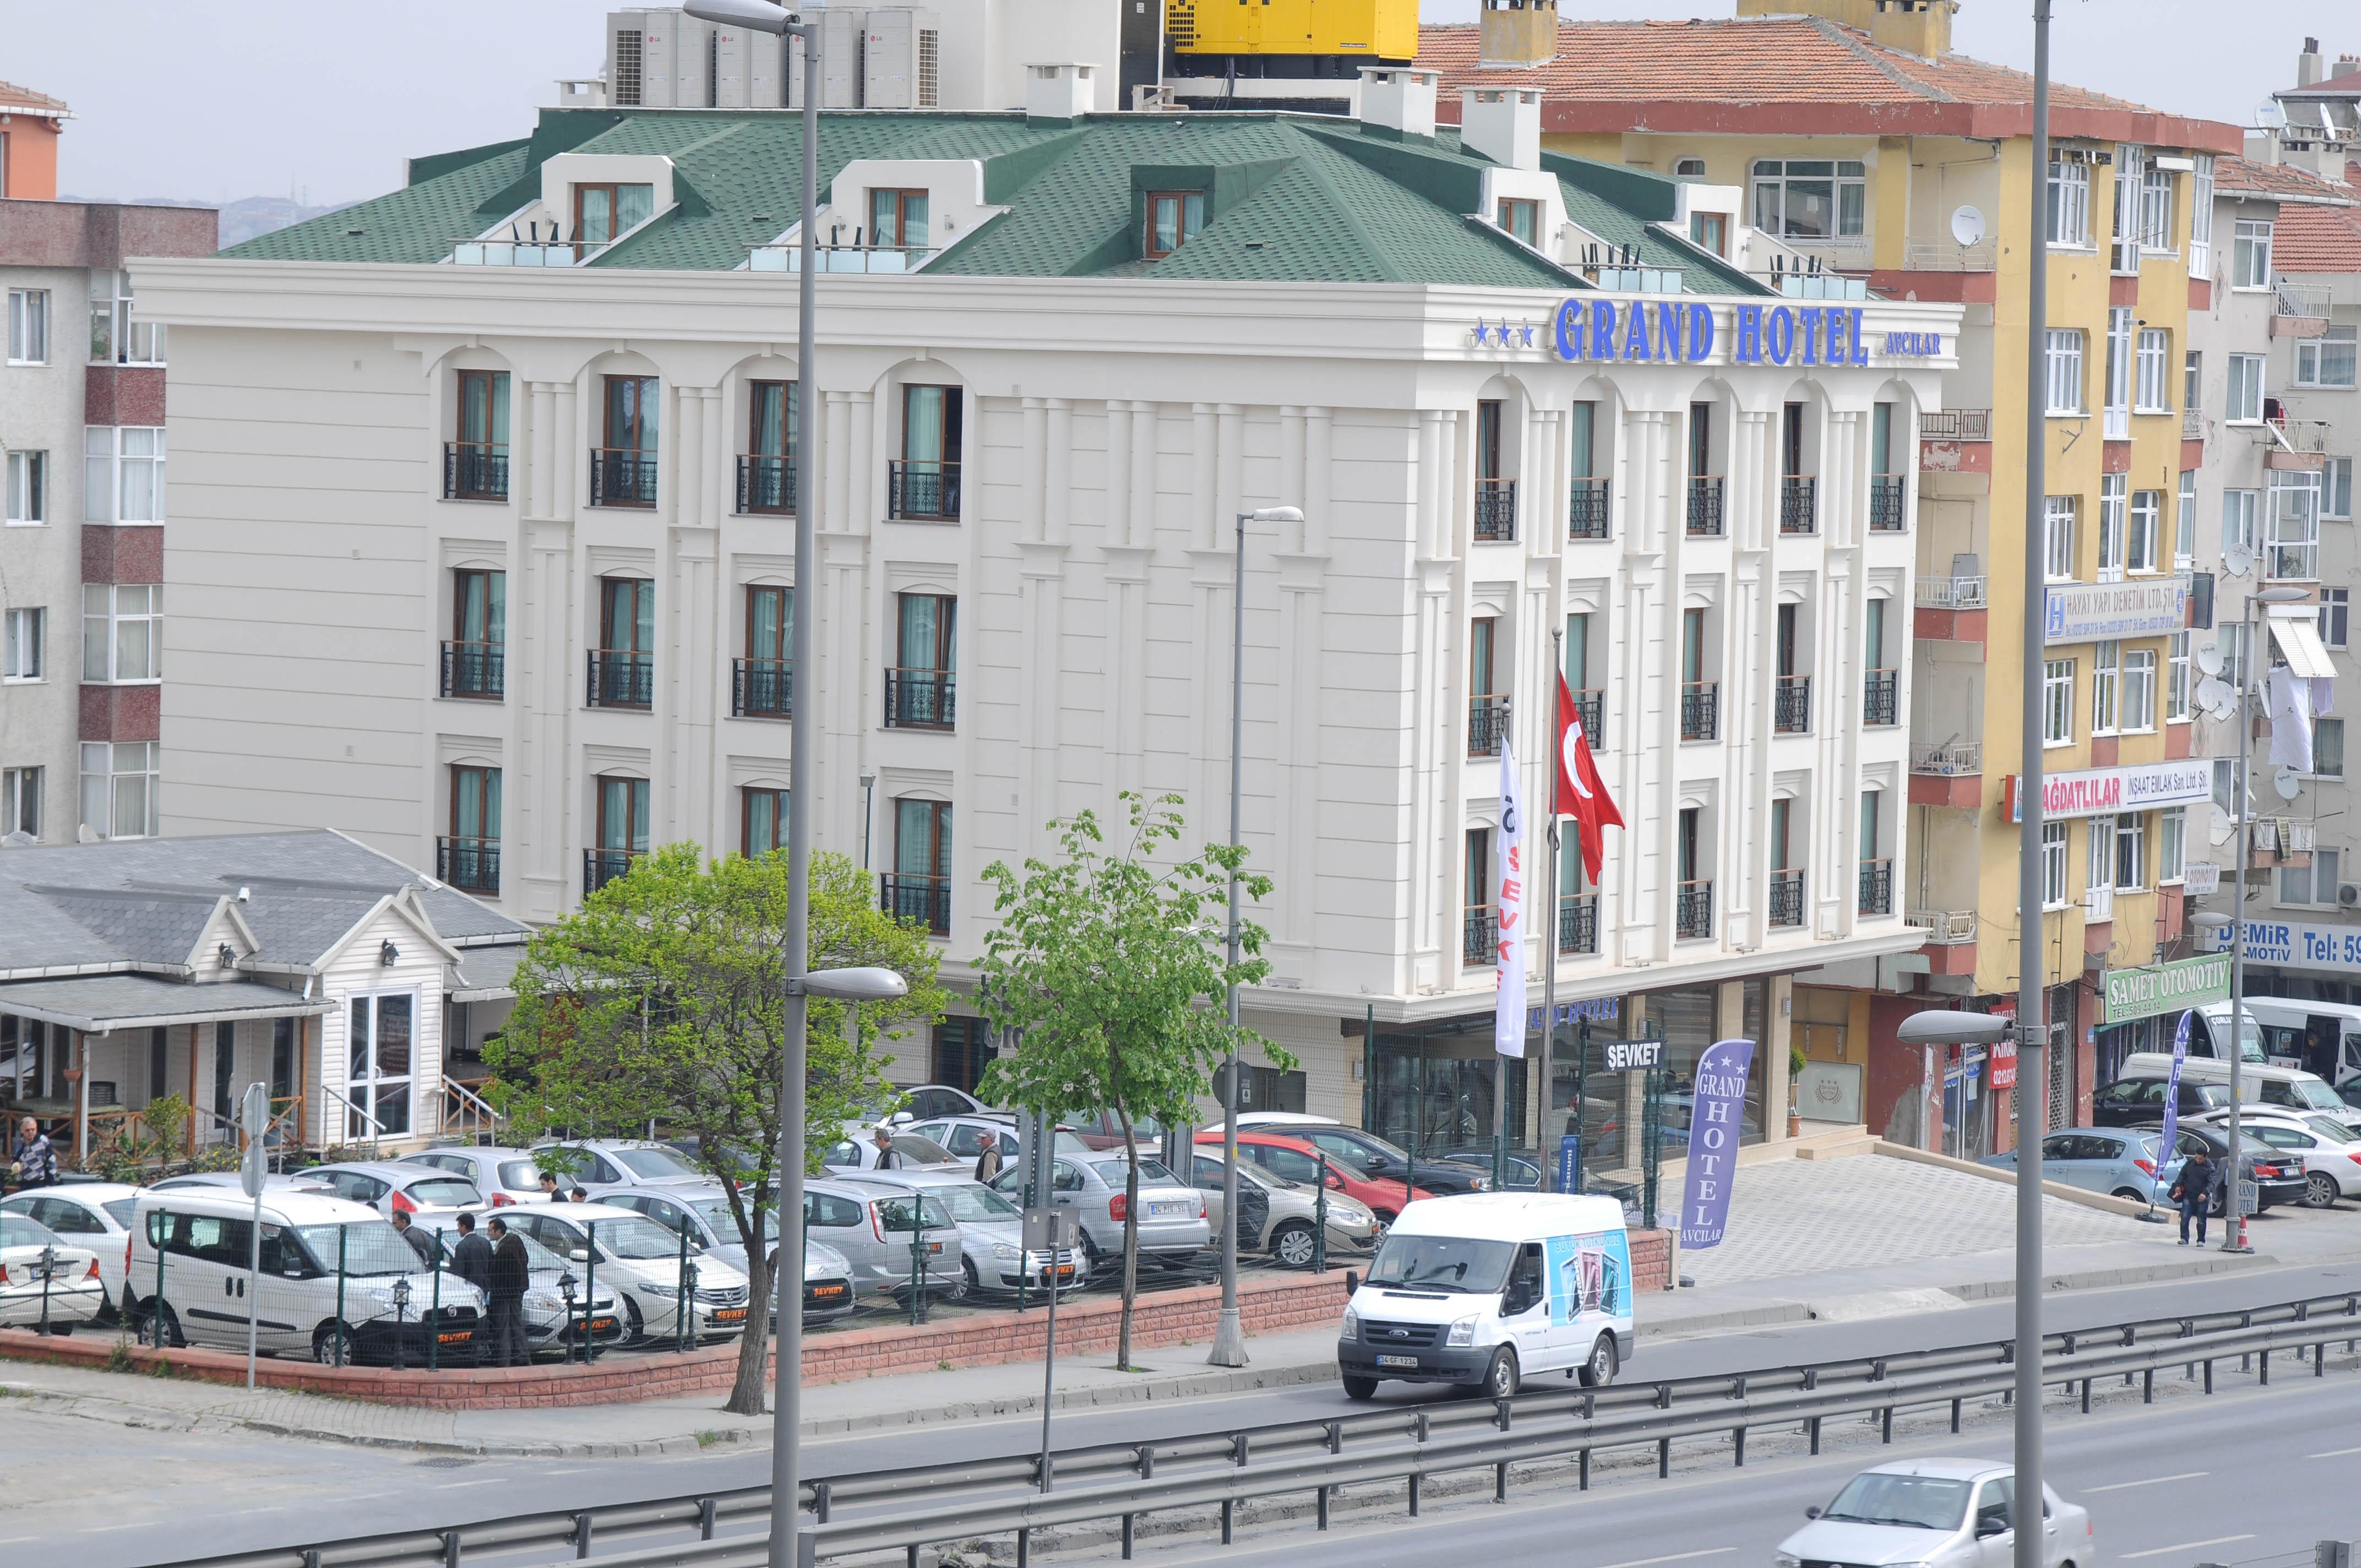 GRAND HOTEL AVCILAR8105